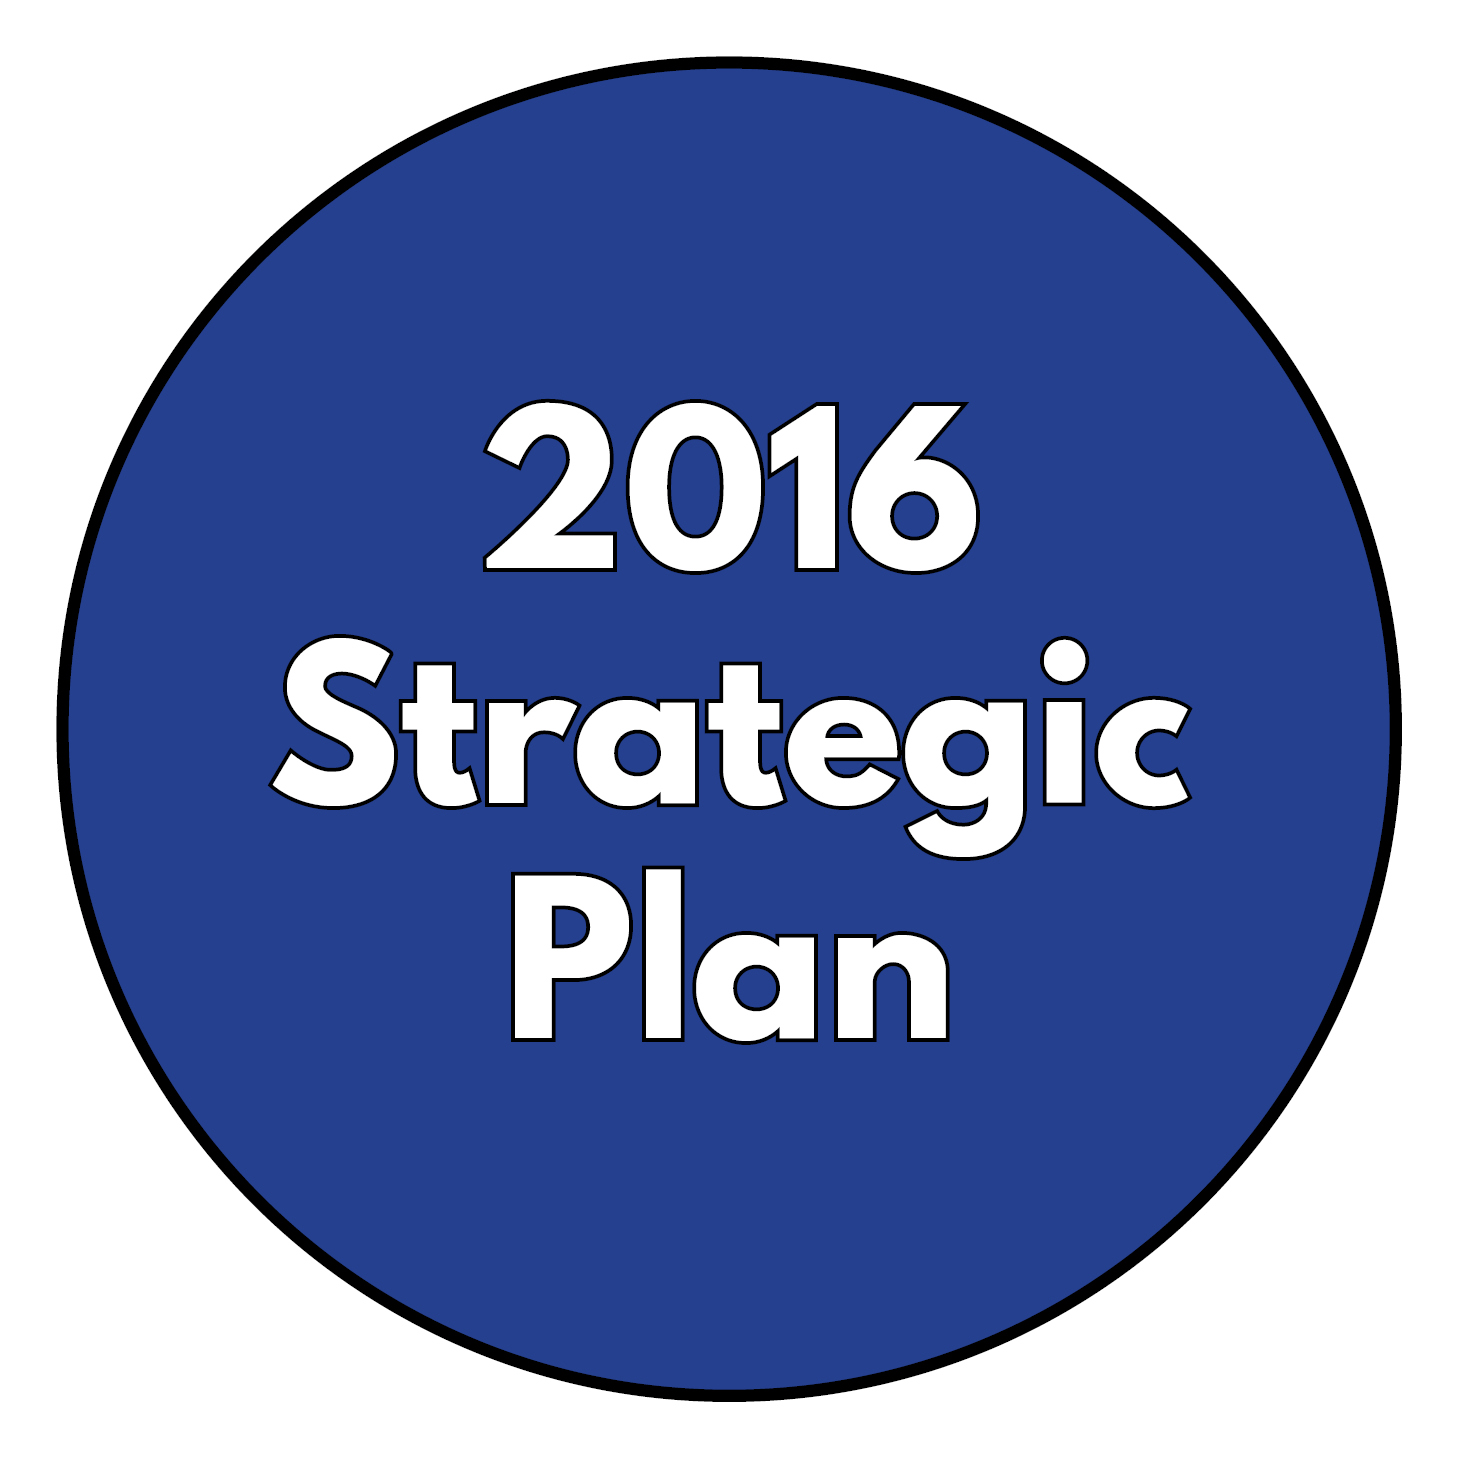 2016 Strategic Plan.jpg